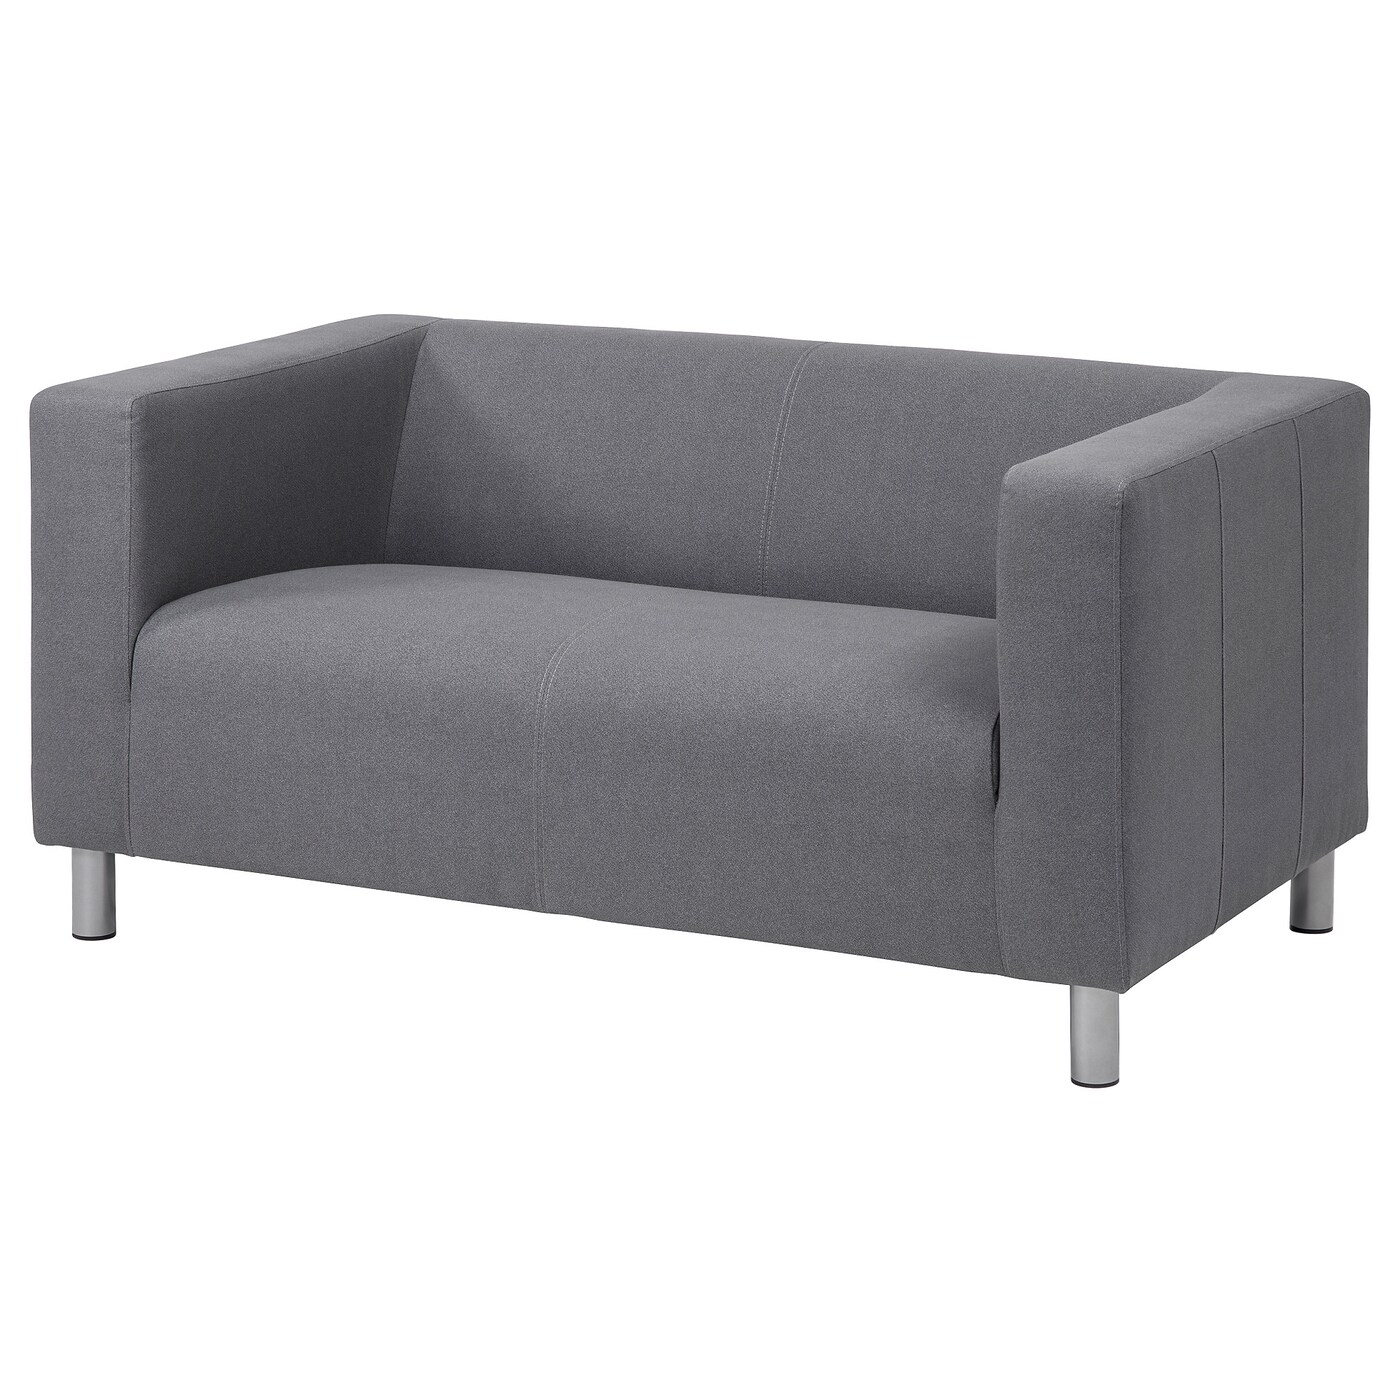 KLIPPAN Compact 10-seat sofa - Flackarp grey